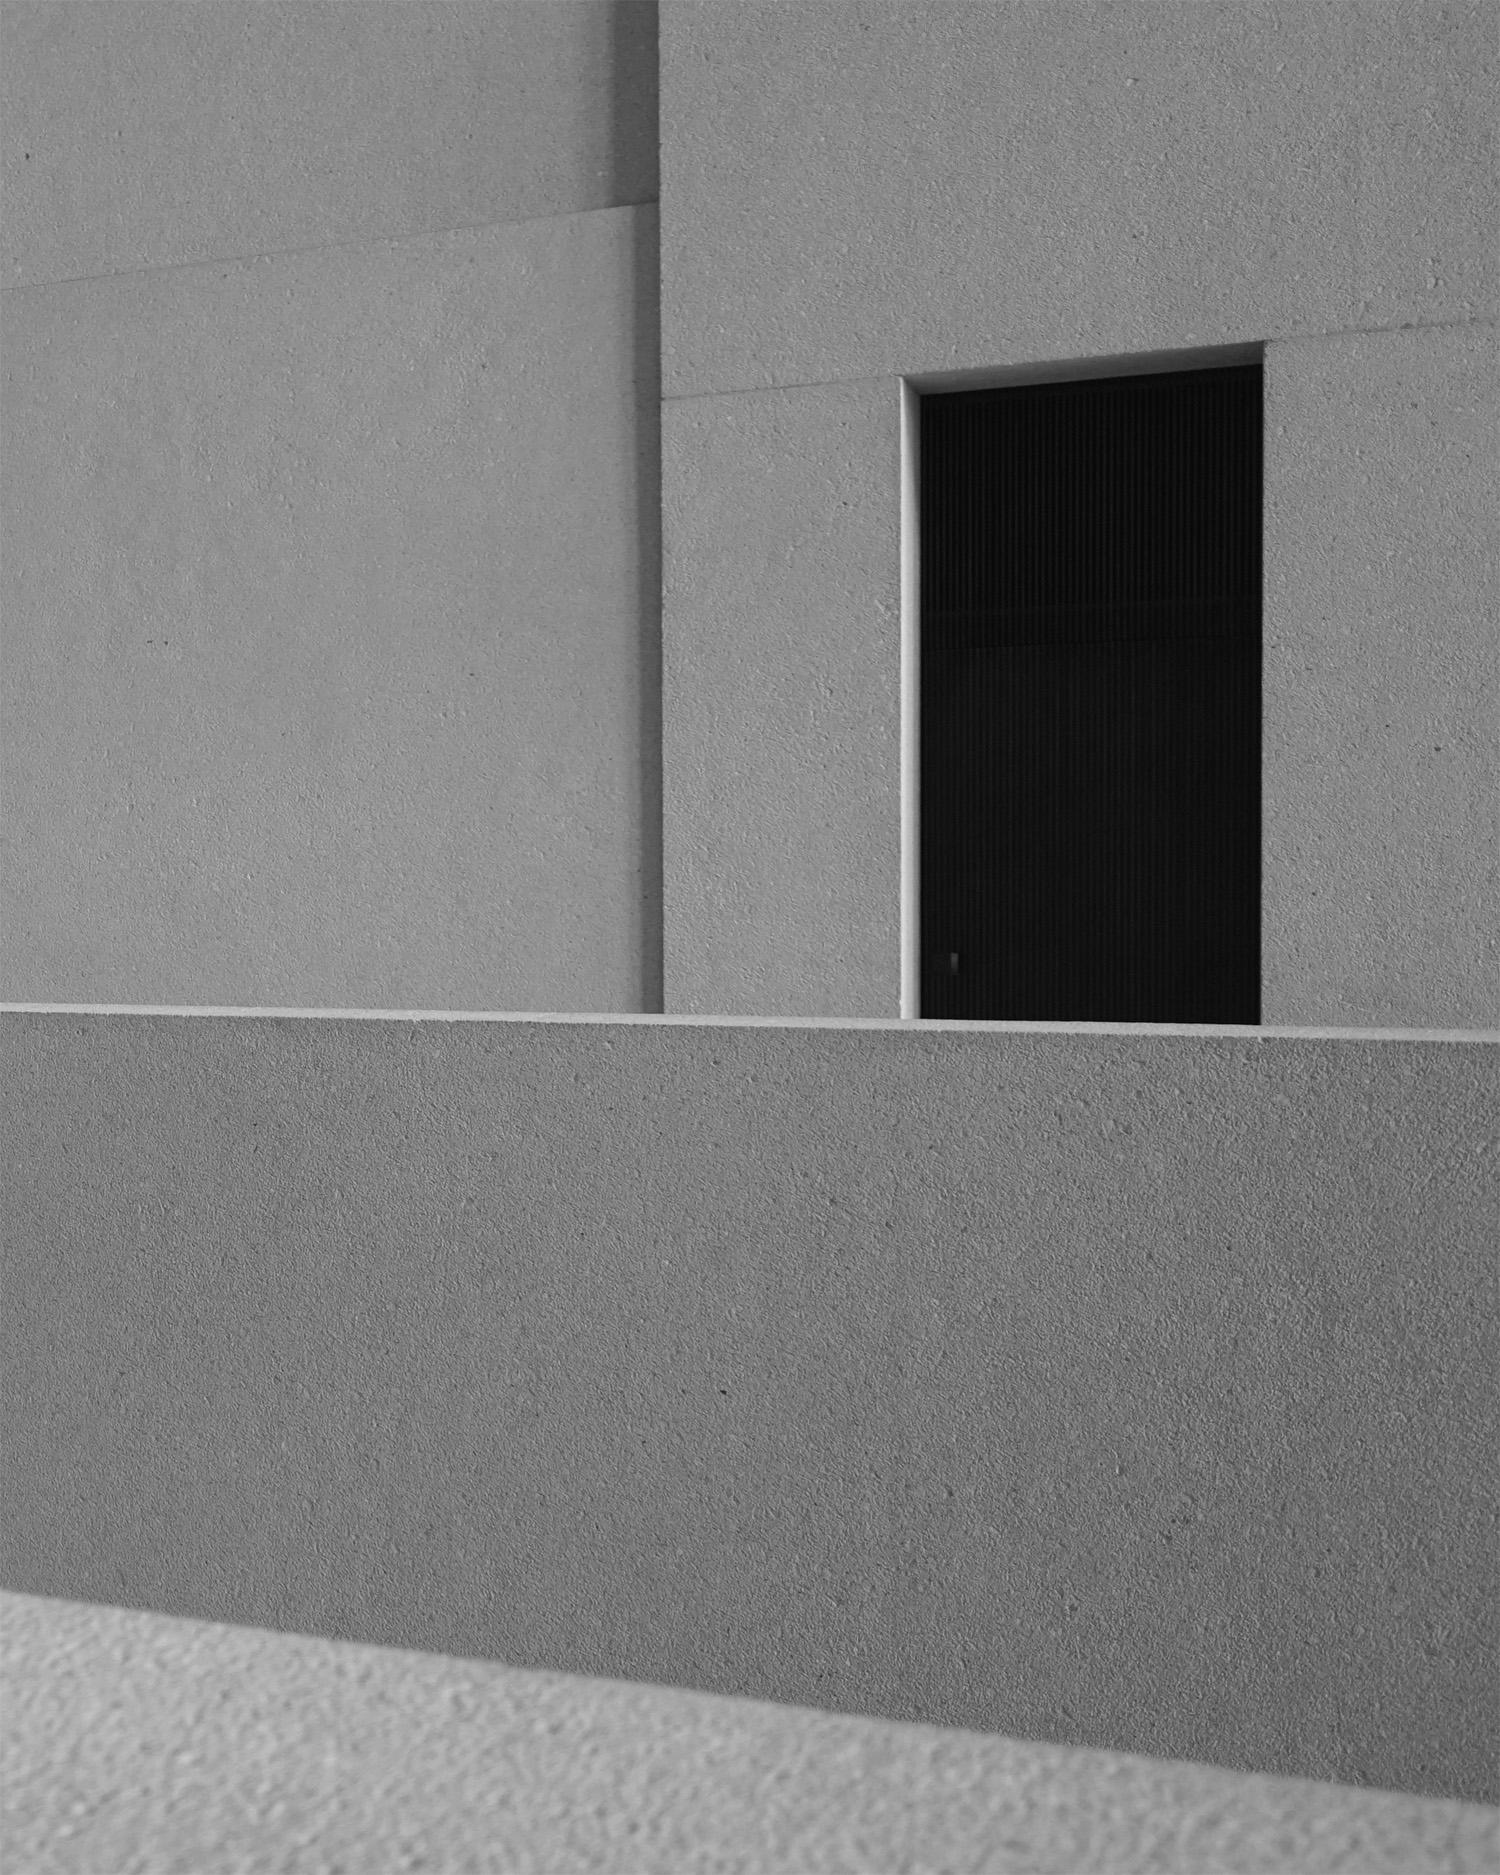 Emily-Grundon_architecture_spaces_0007.jpg